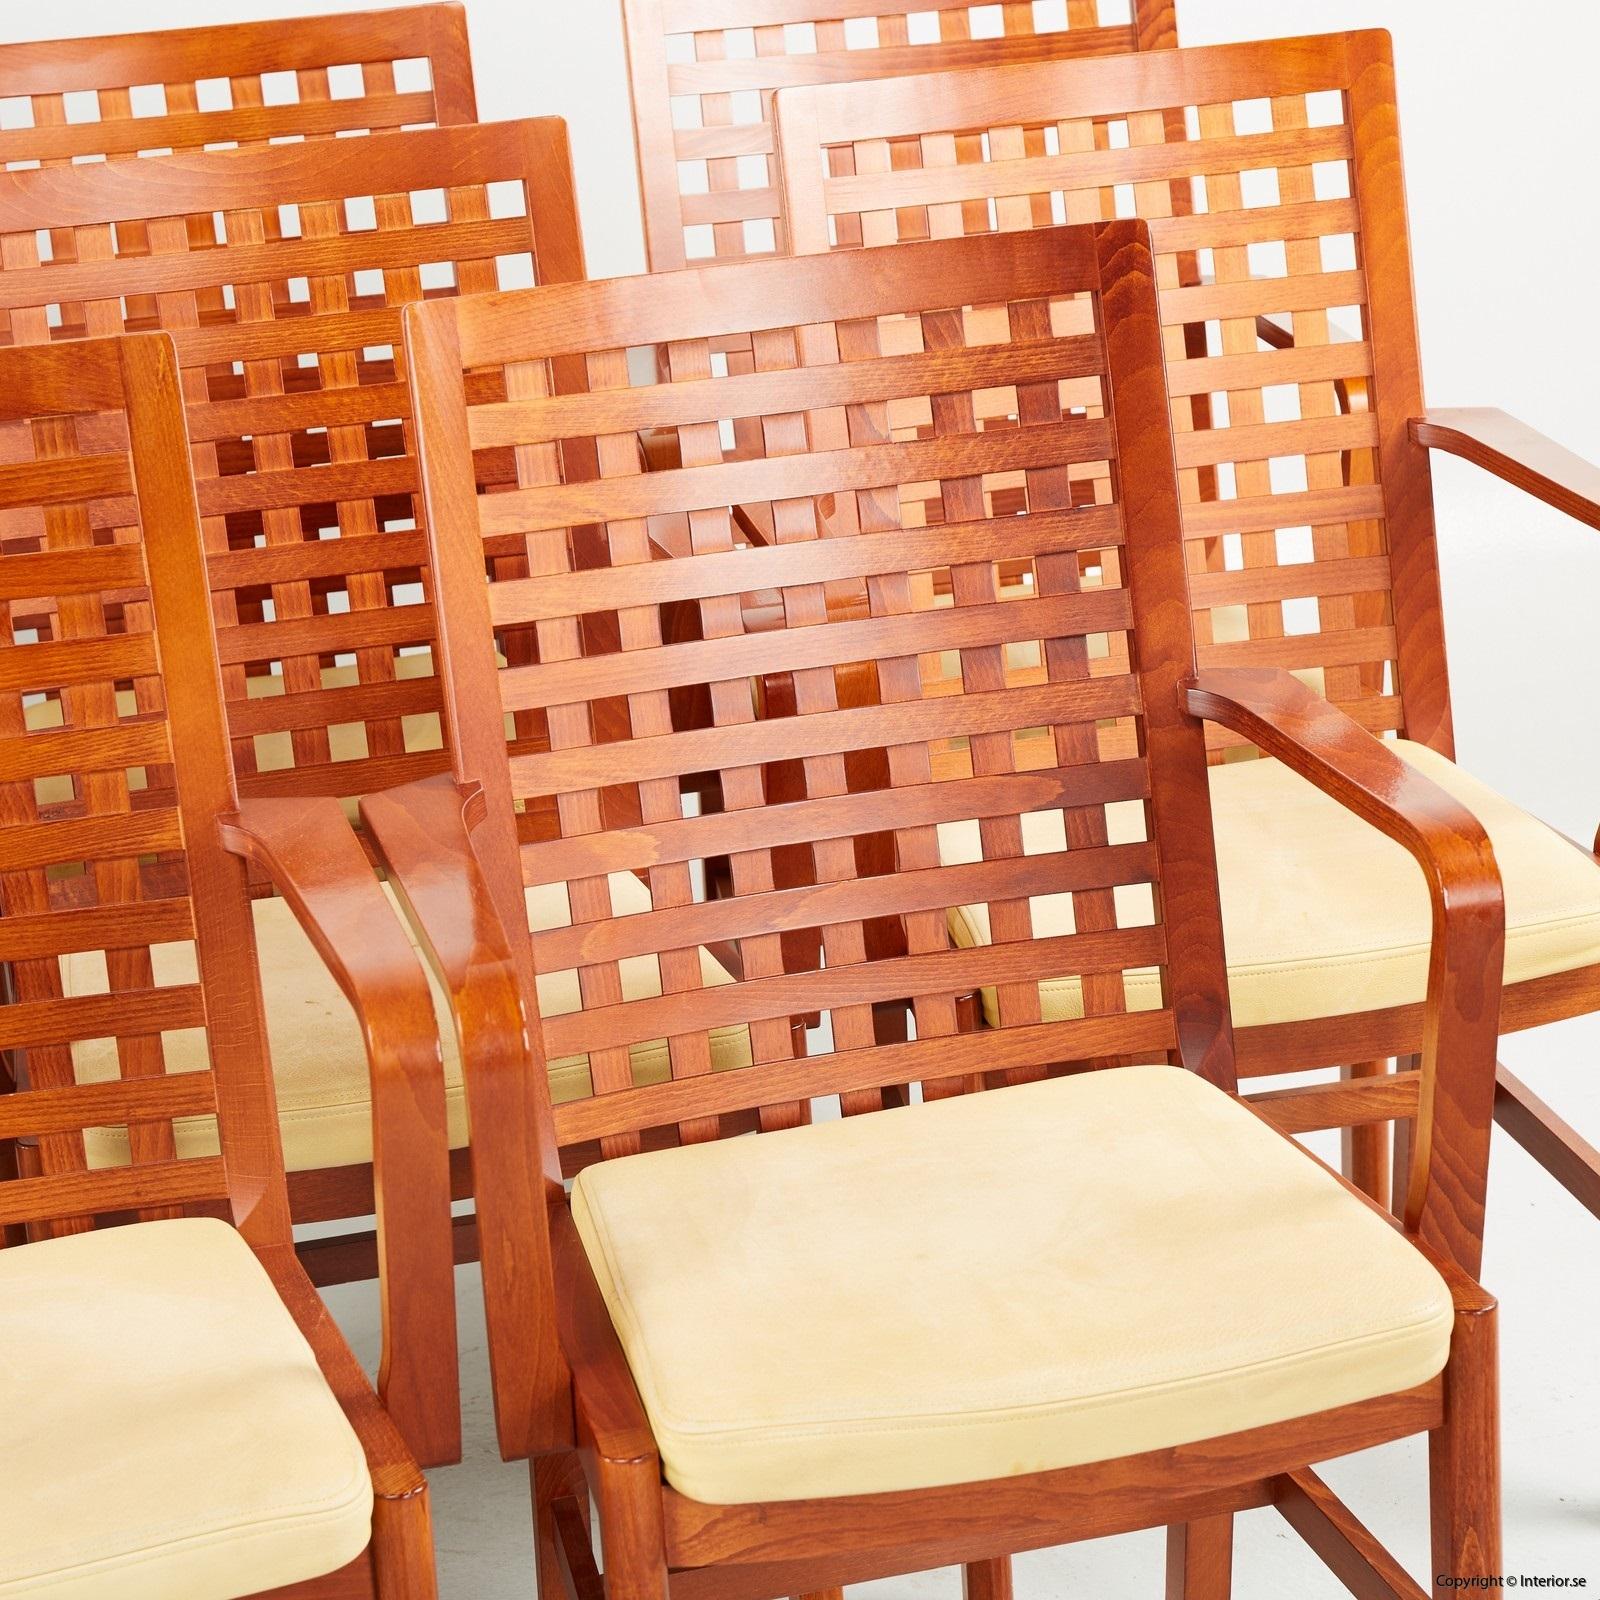 1 Konferensstolar Conference Chairs, Kvist Industries - Lädersits - Design furniture (2)